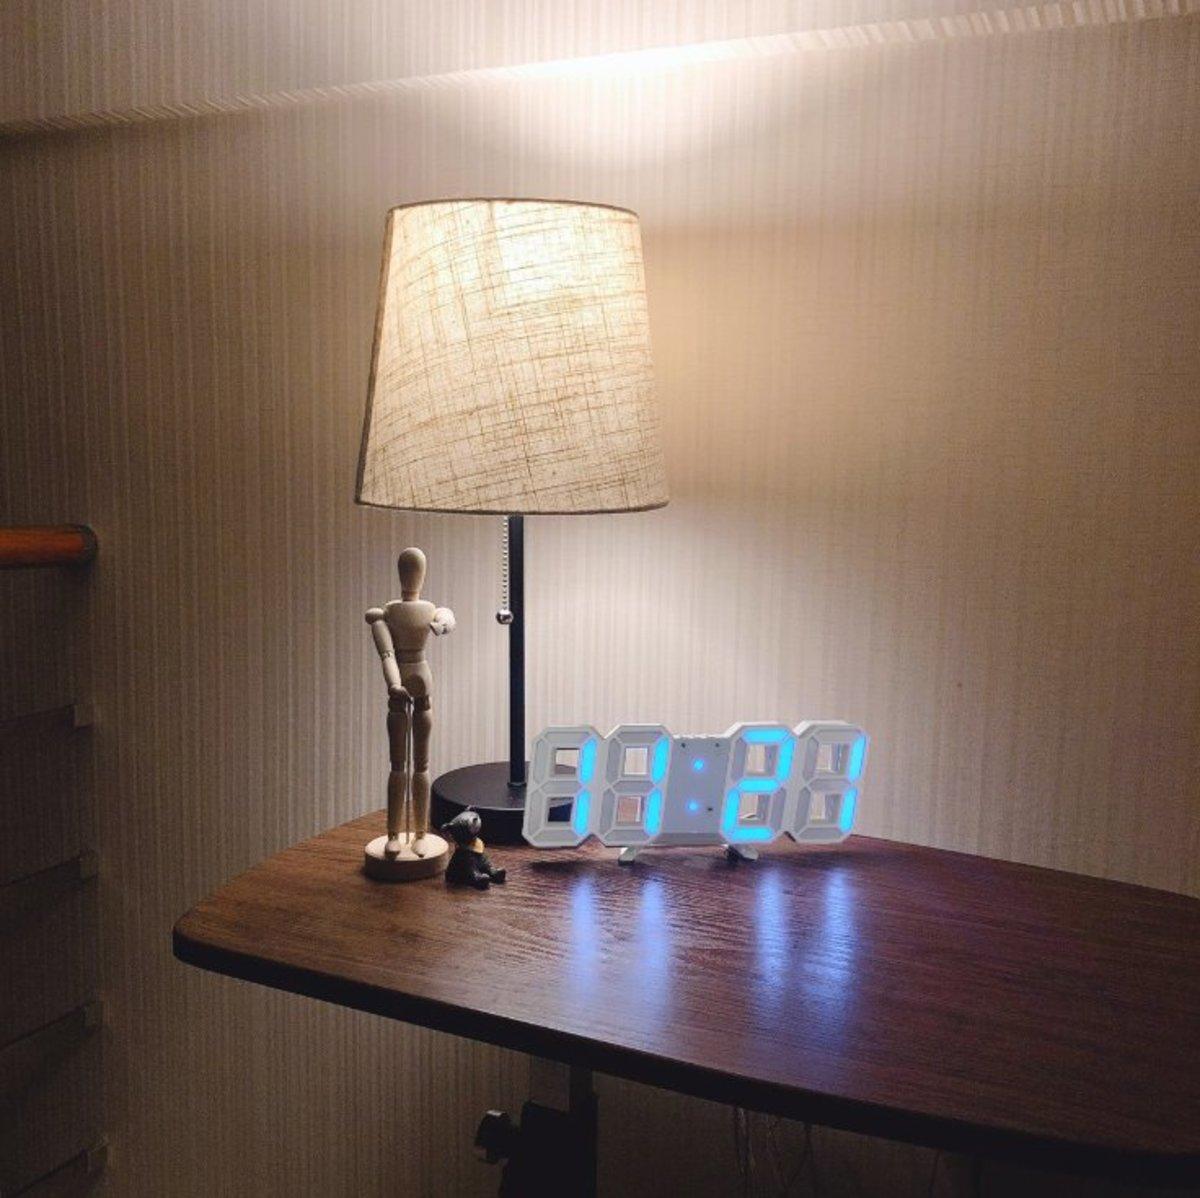 (Blue Light) Creative USB LED Digital Wall/Table Alarm Clock